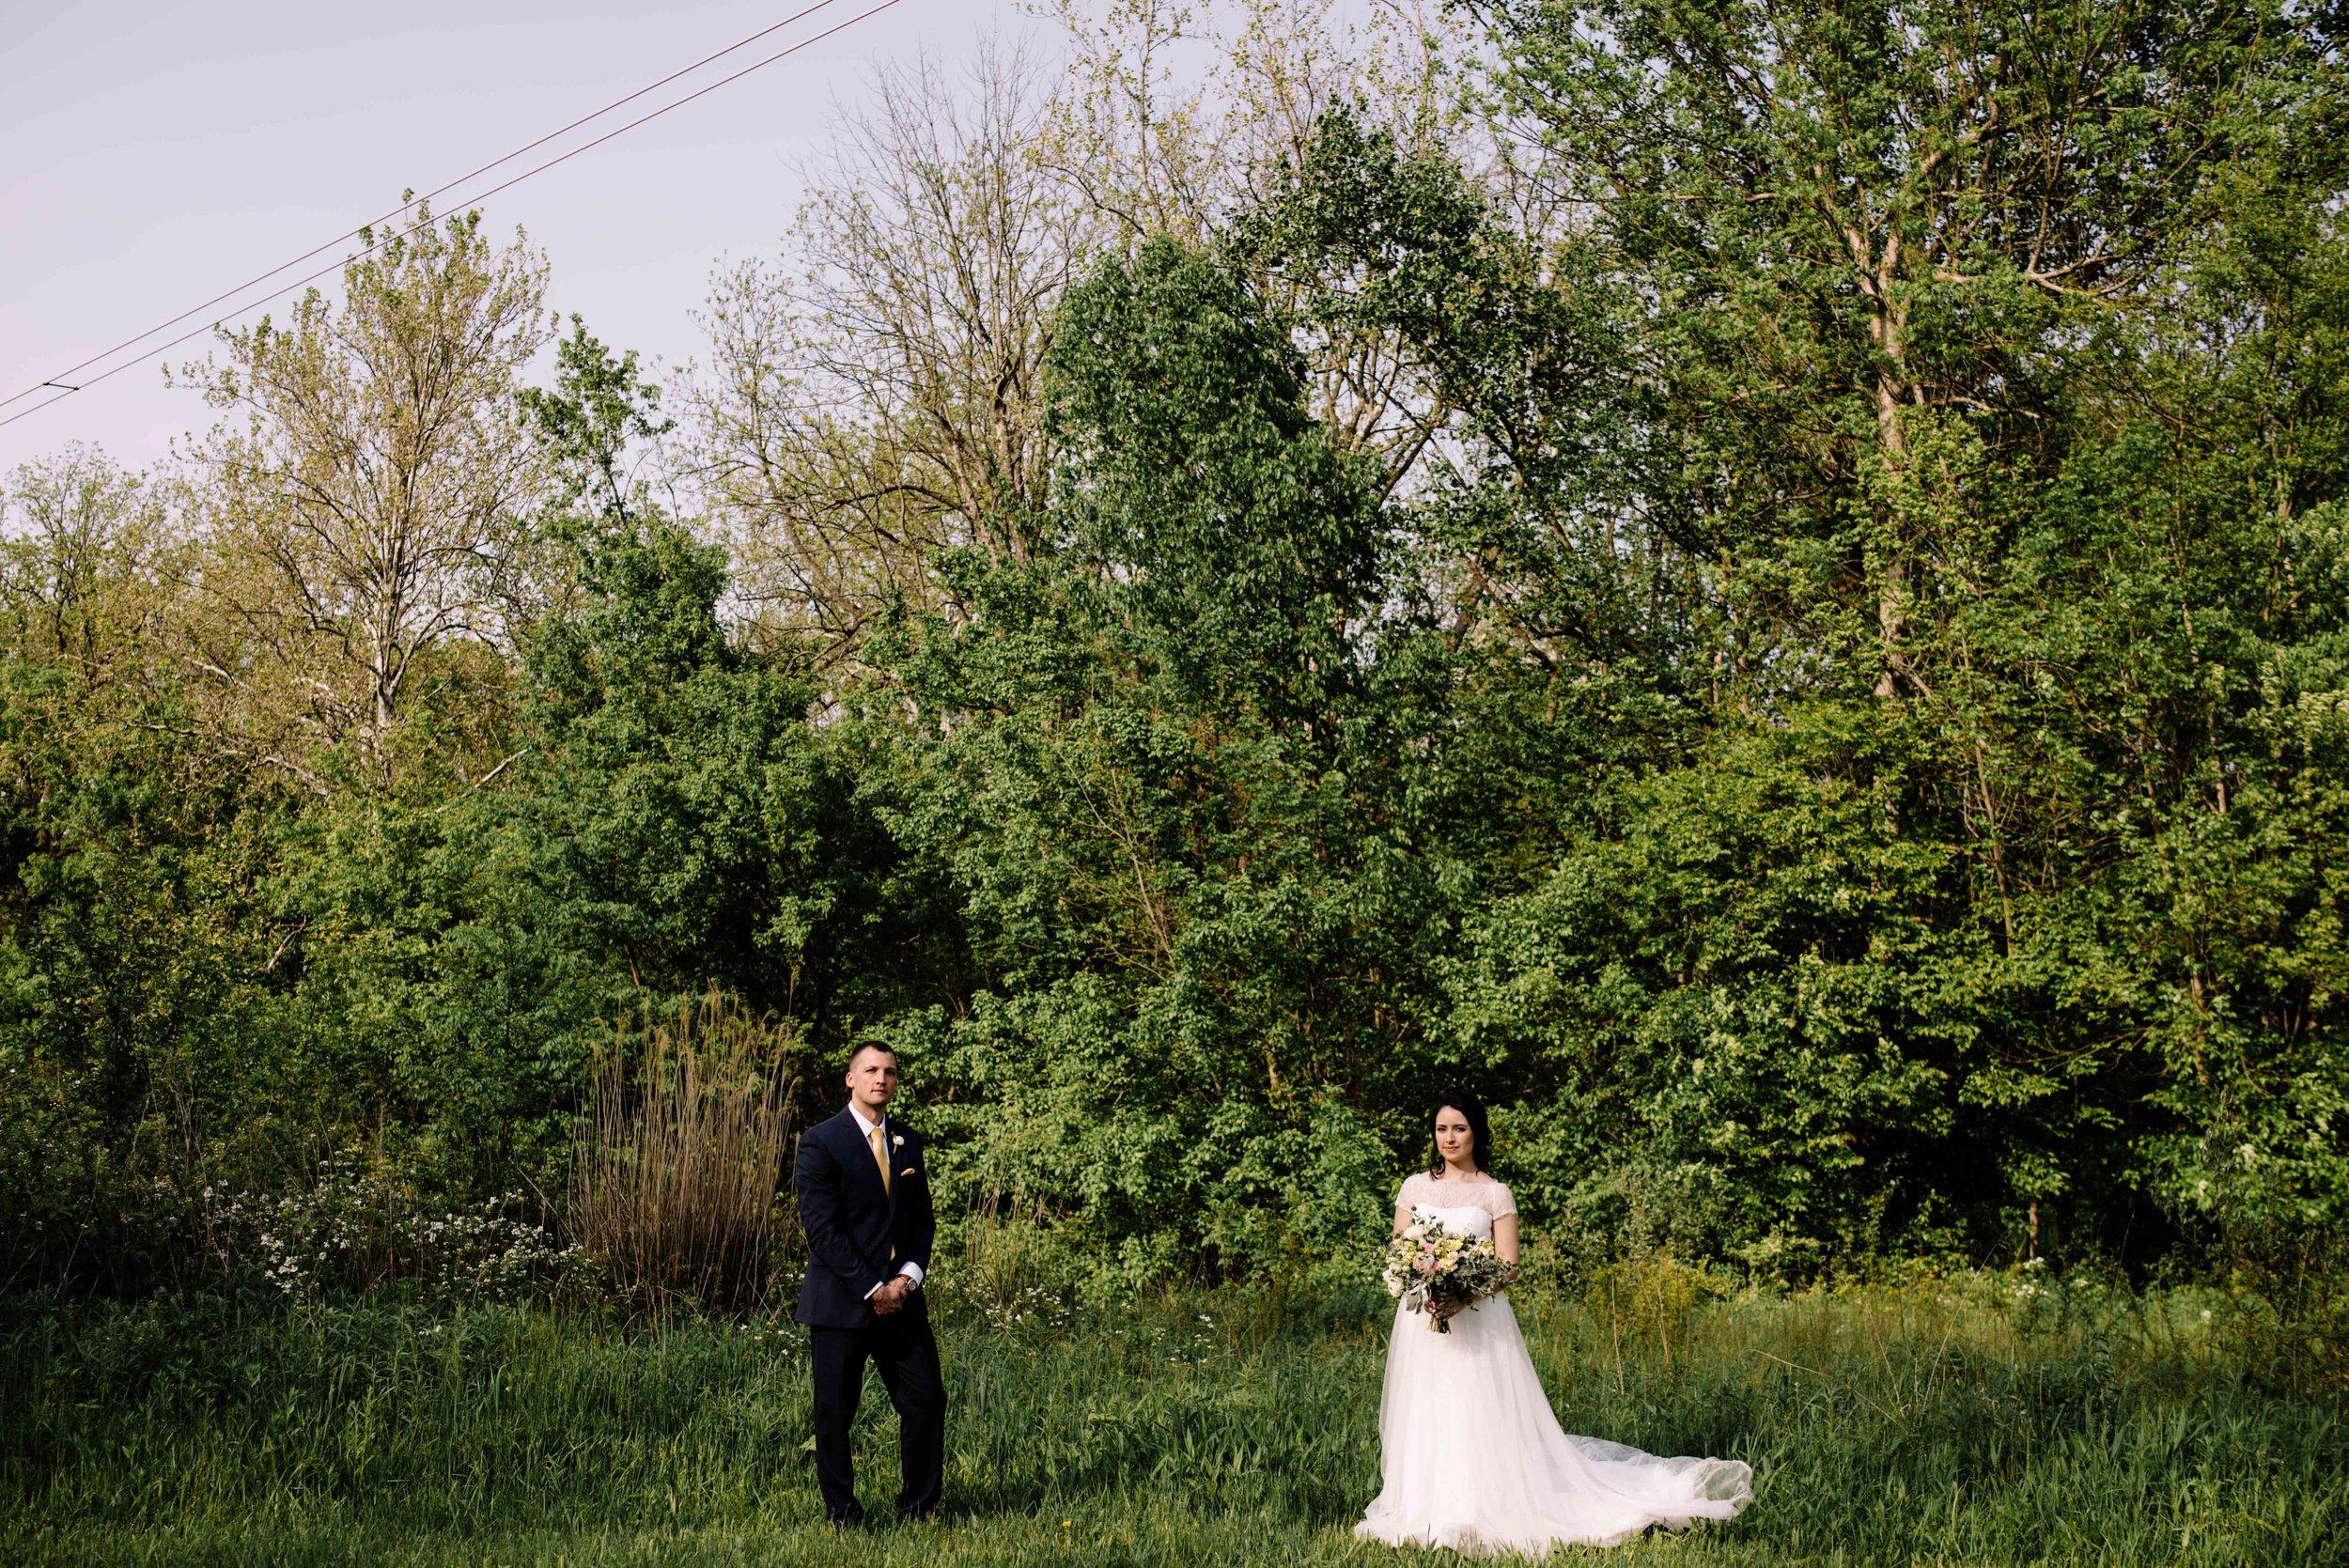 Ana-Dan-Blog-Indianapolis-Wedding-65.jpg